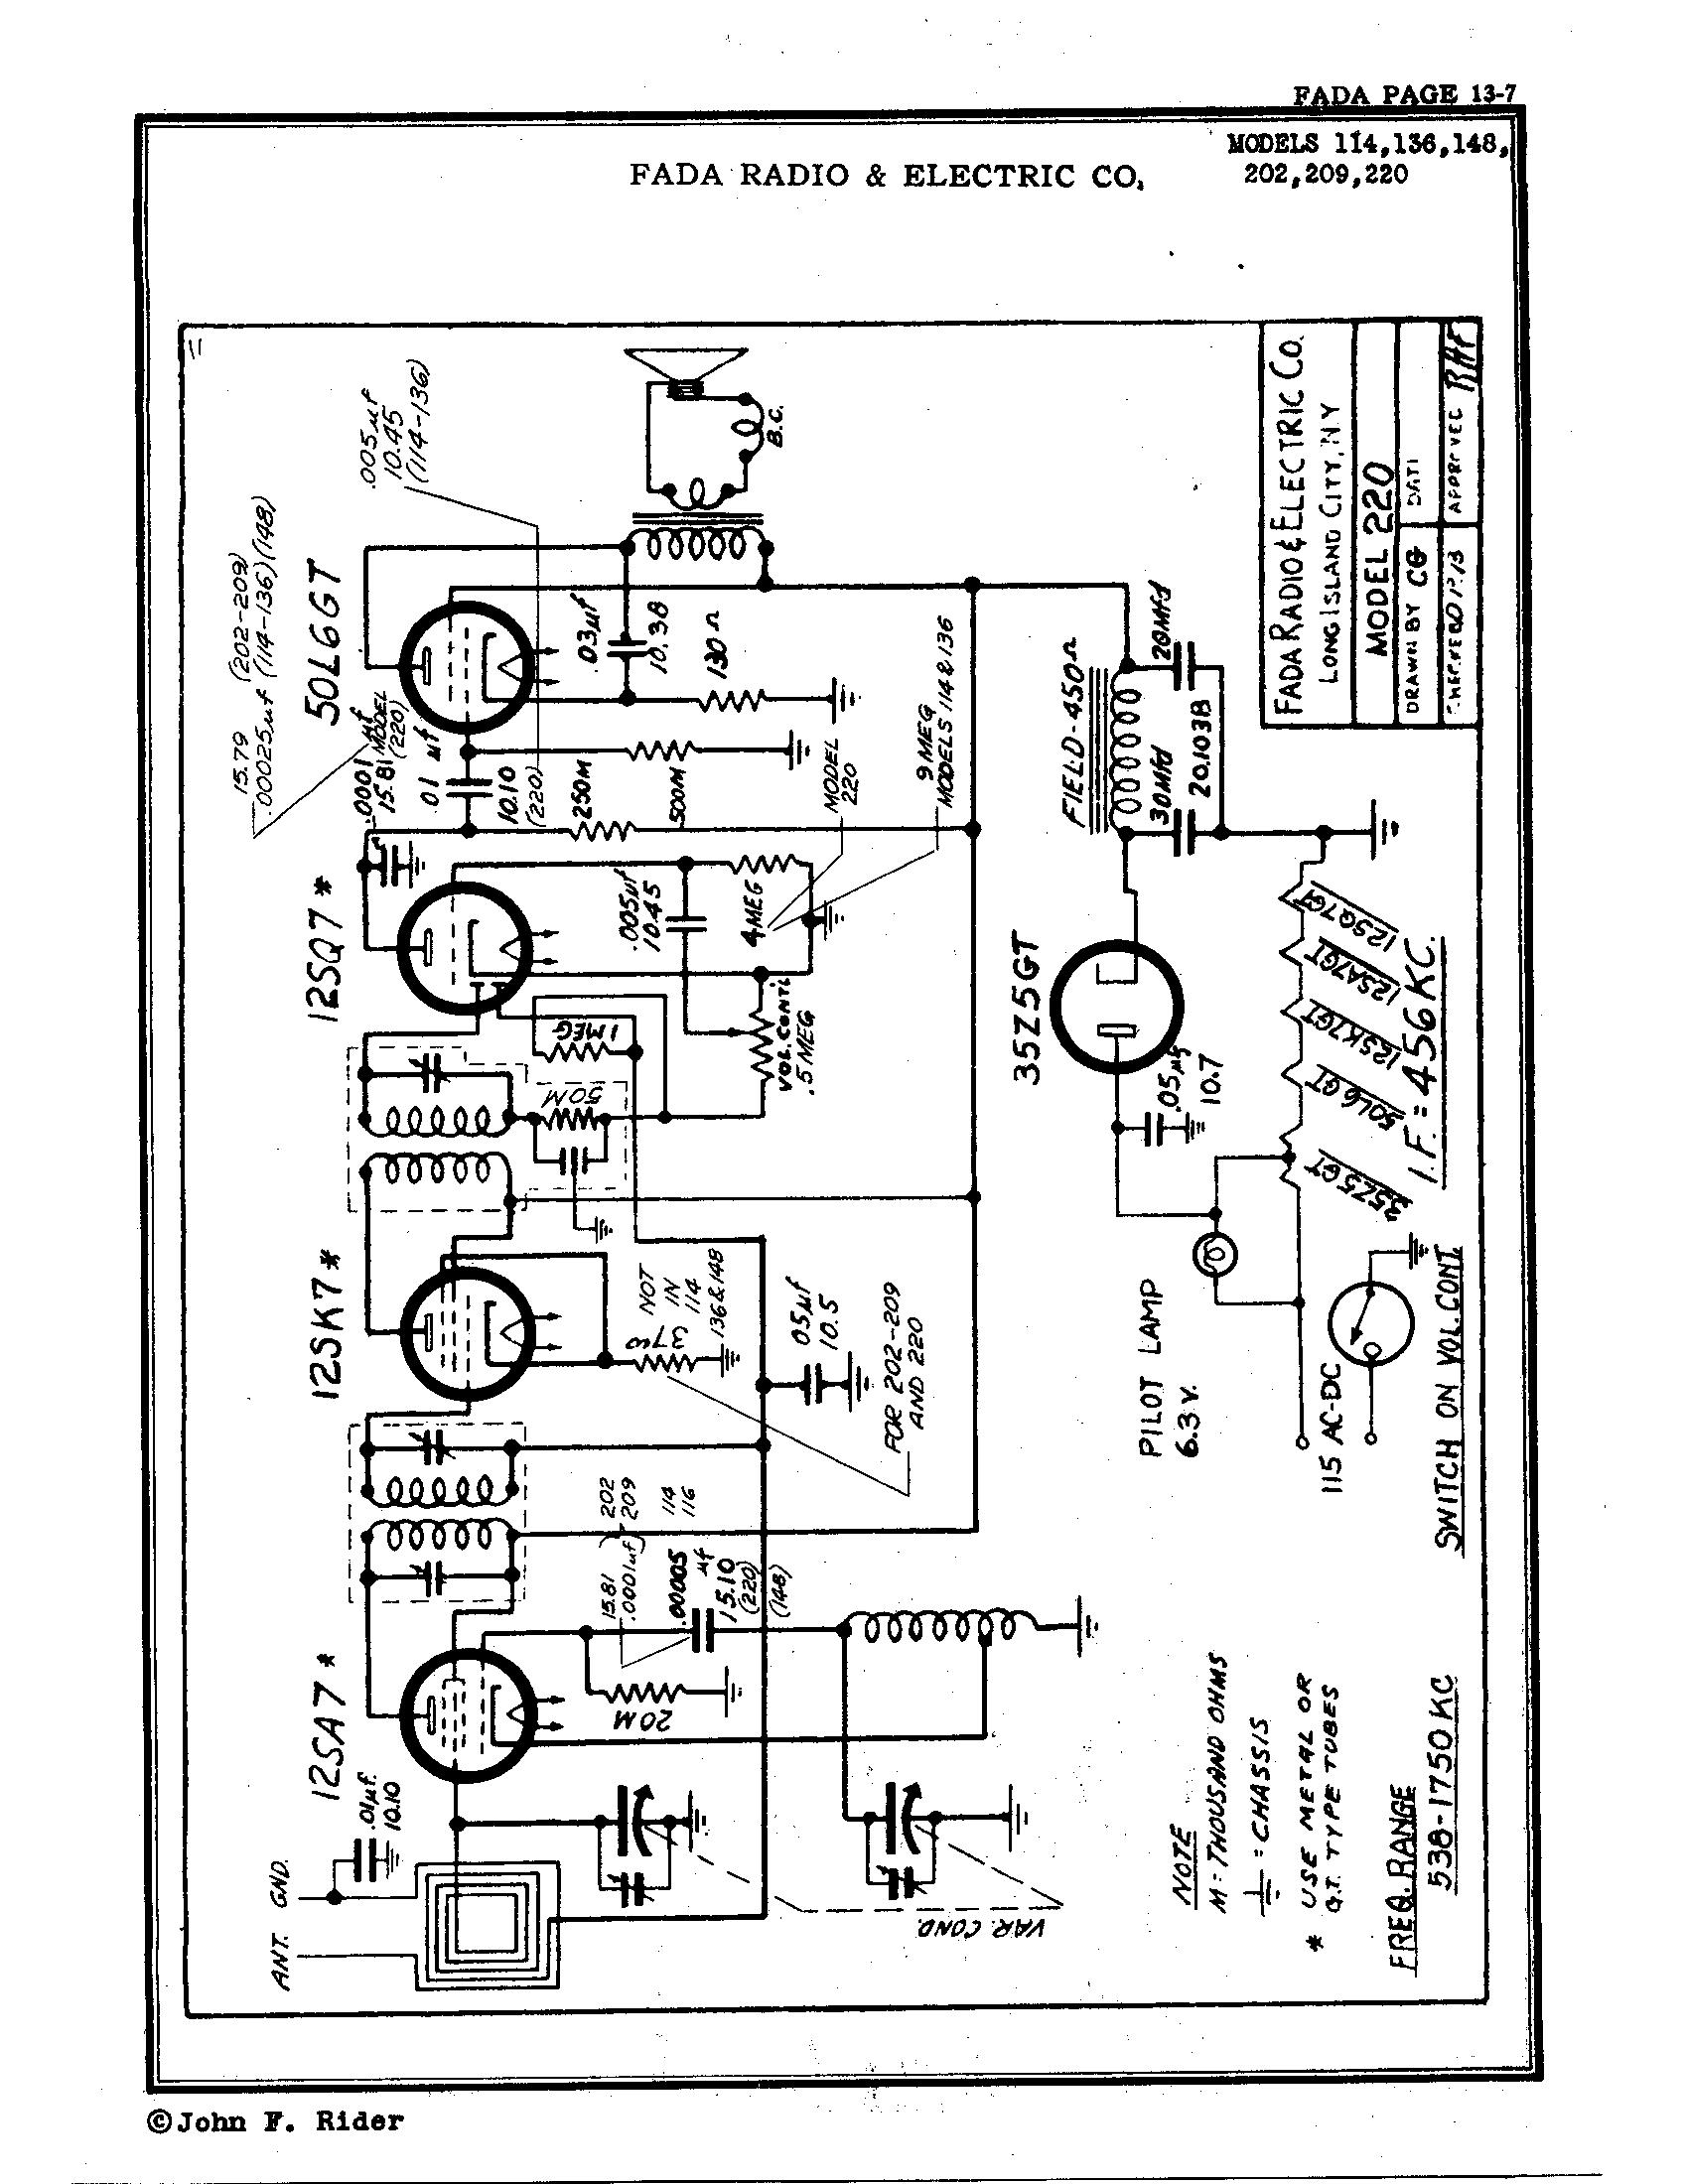 fada radio  u0026 electric co   inc  136